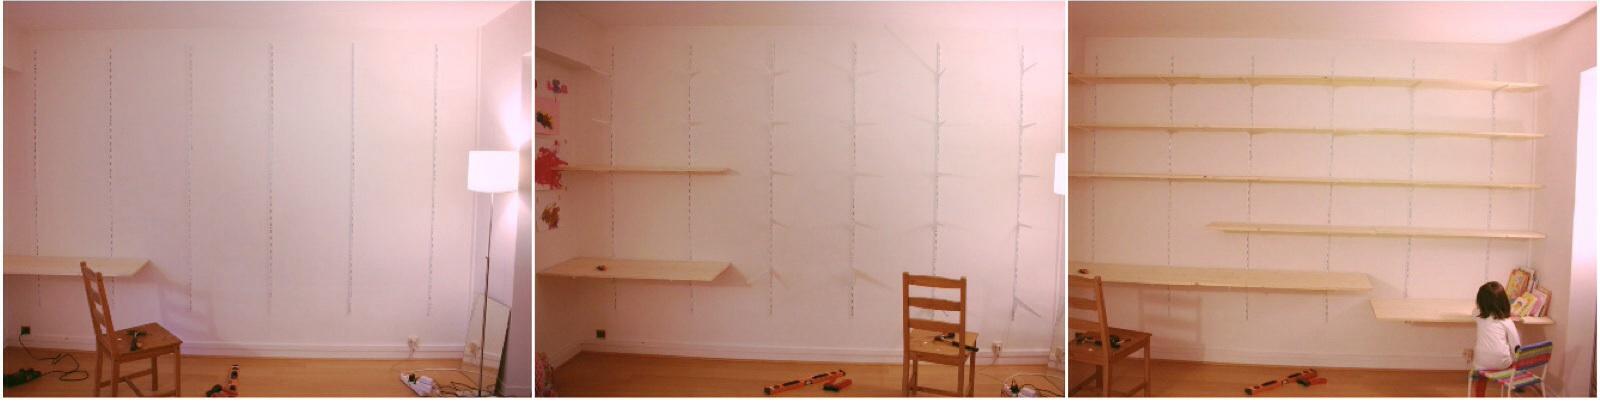 fabriquer sa bibliotheque sur mesure soi meme diy. Black Bedroom Furniture Sets. Home Design Ideas